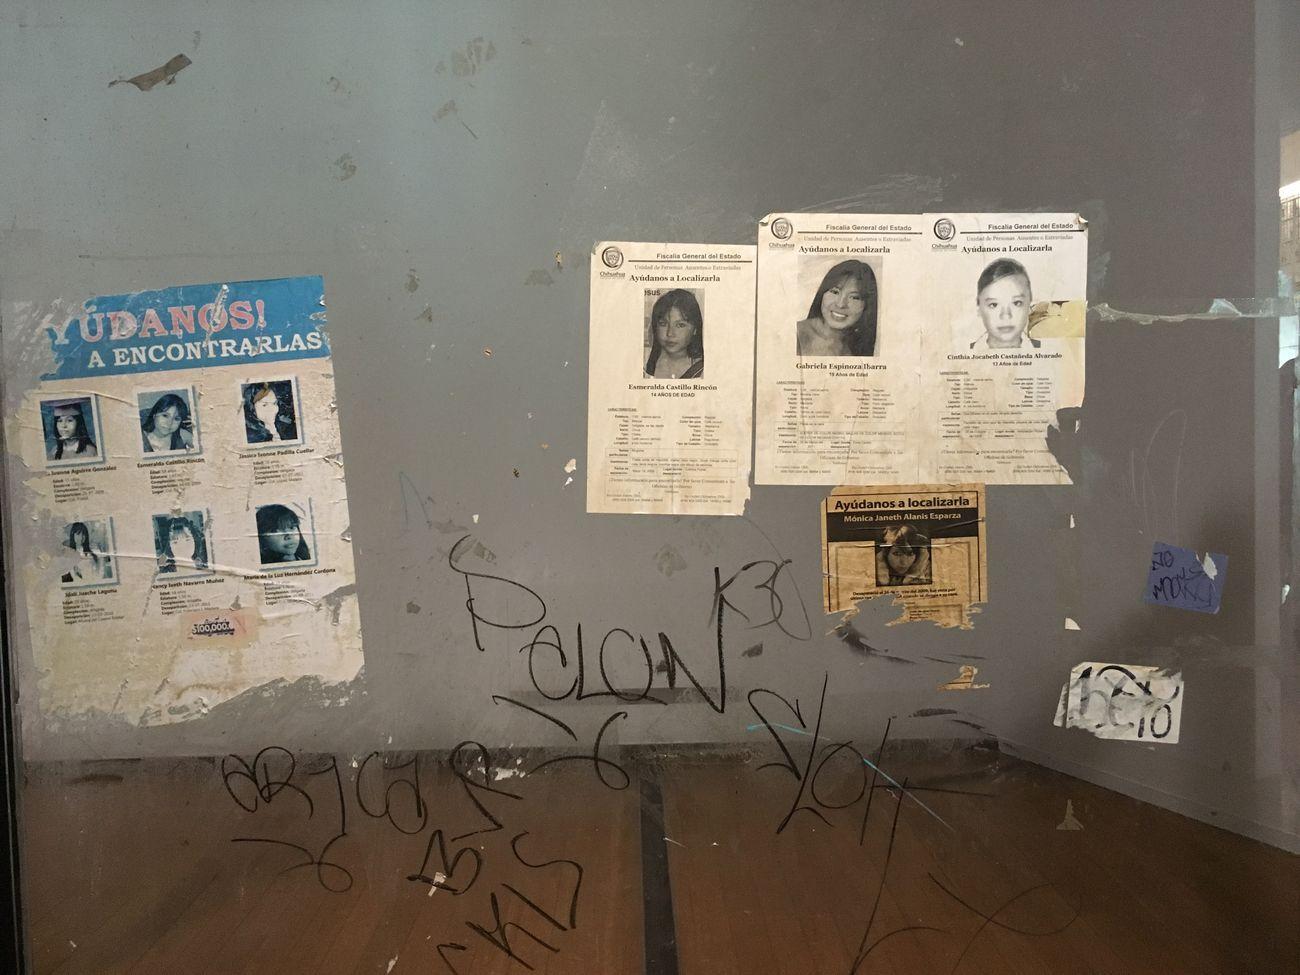 Teresa Margolles. Ya basta hijos de puta. Exhibition view at PAC, Milano 2018